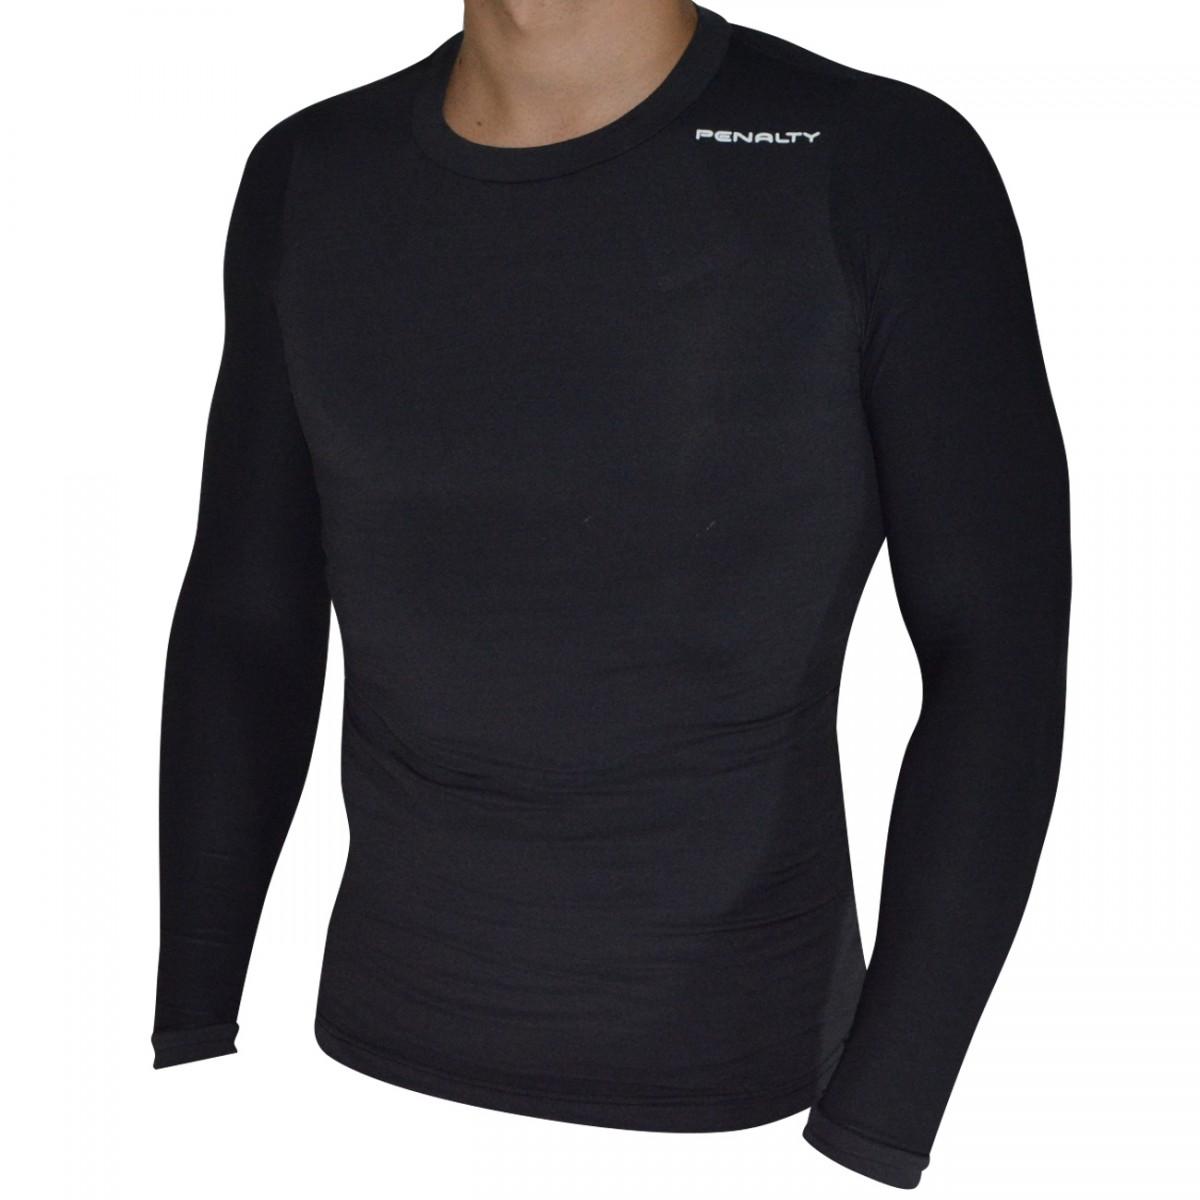 59a2b7928c Camisa Termica Penalty Matis VI ML 3019599000 - Preto - Chuteira Nike